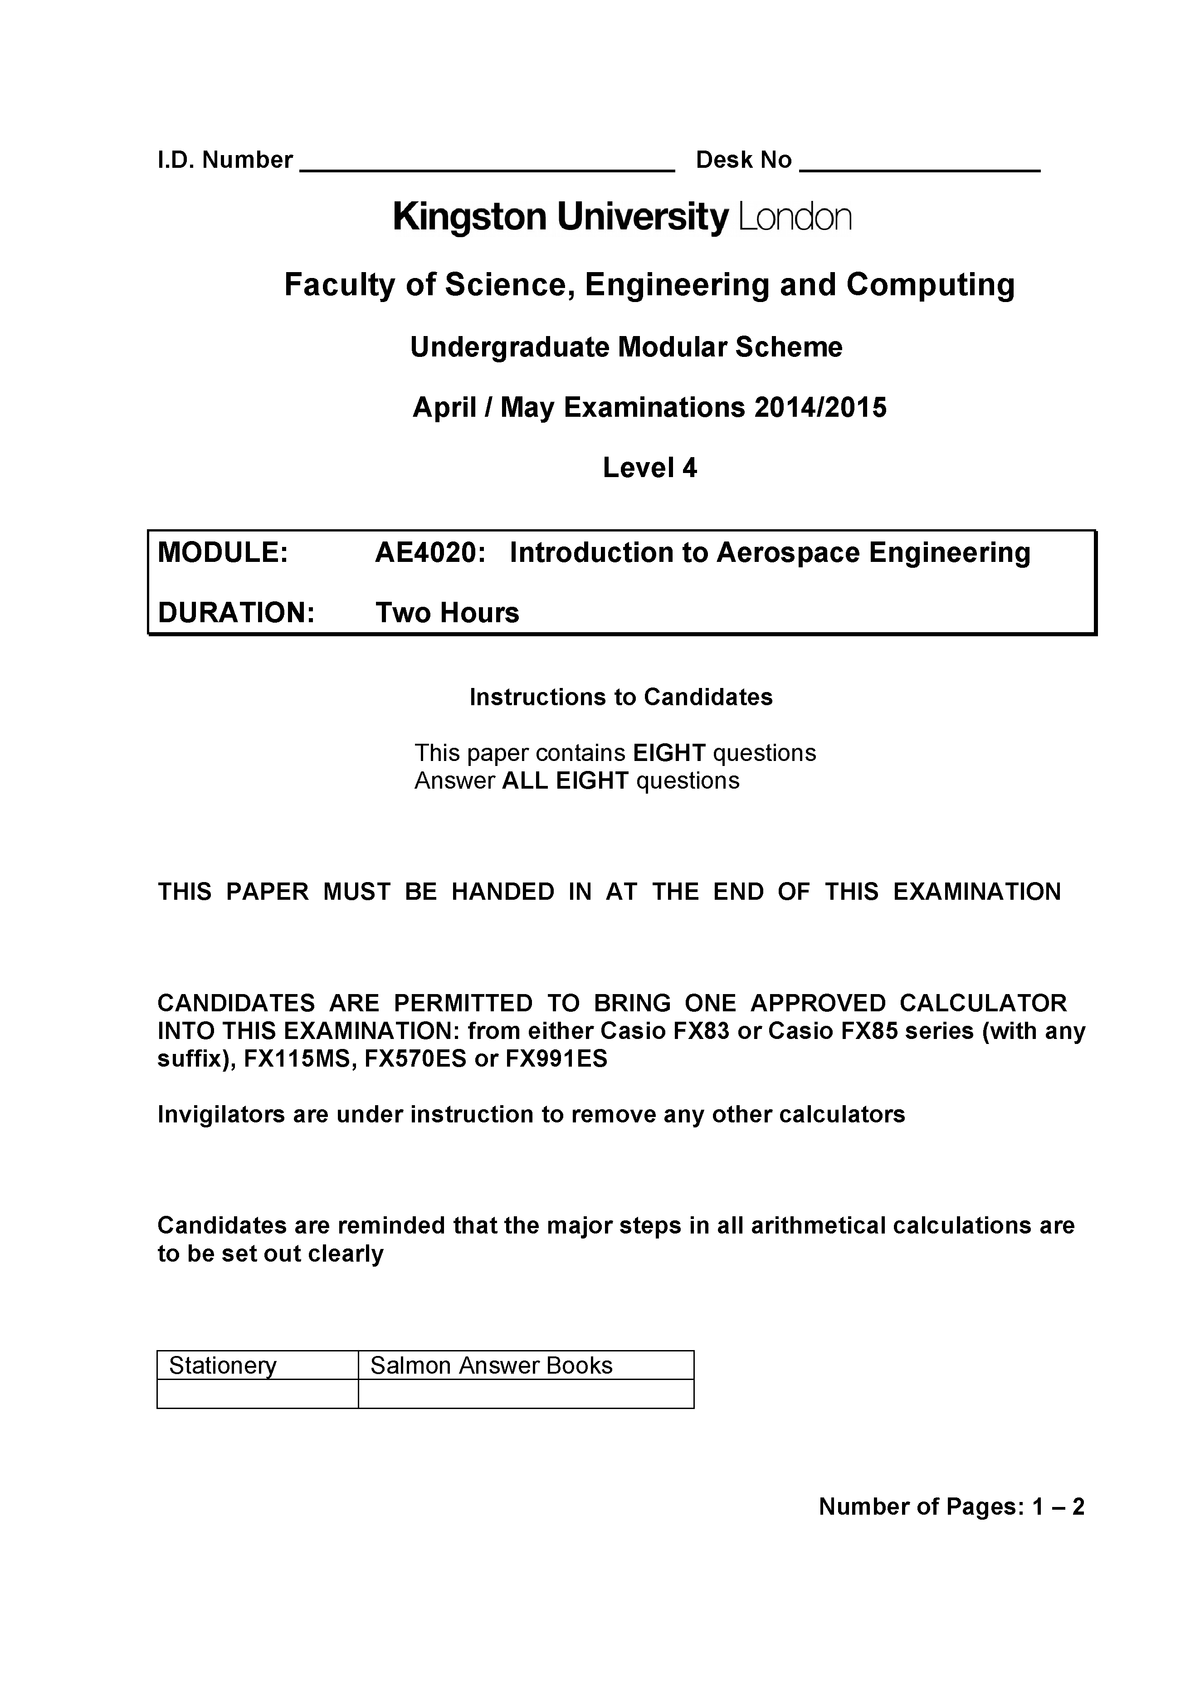 Exam 2015 - AE4020: Introduction to Aerospace Engineering - StuDocu